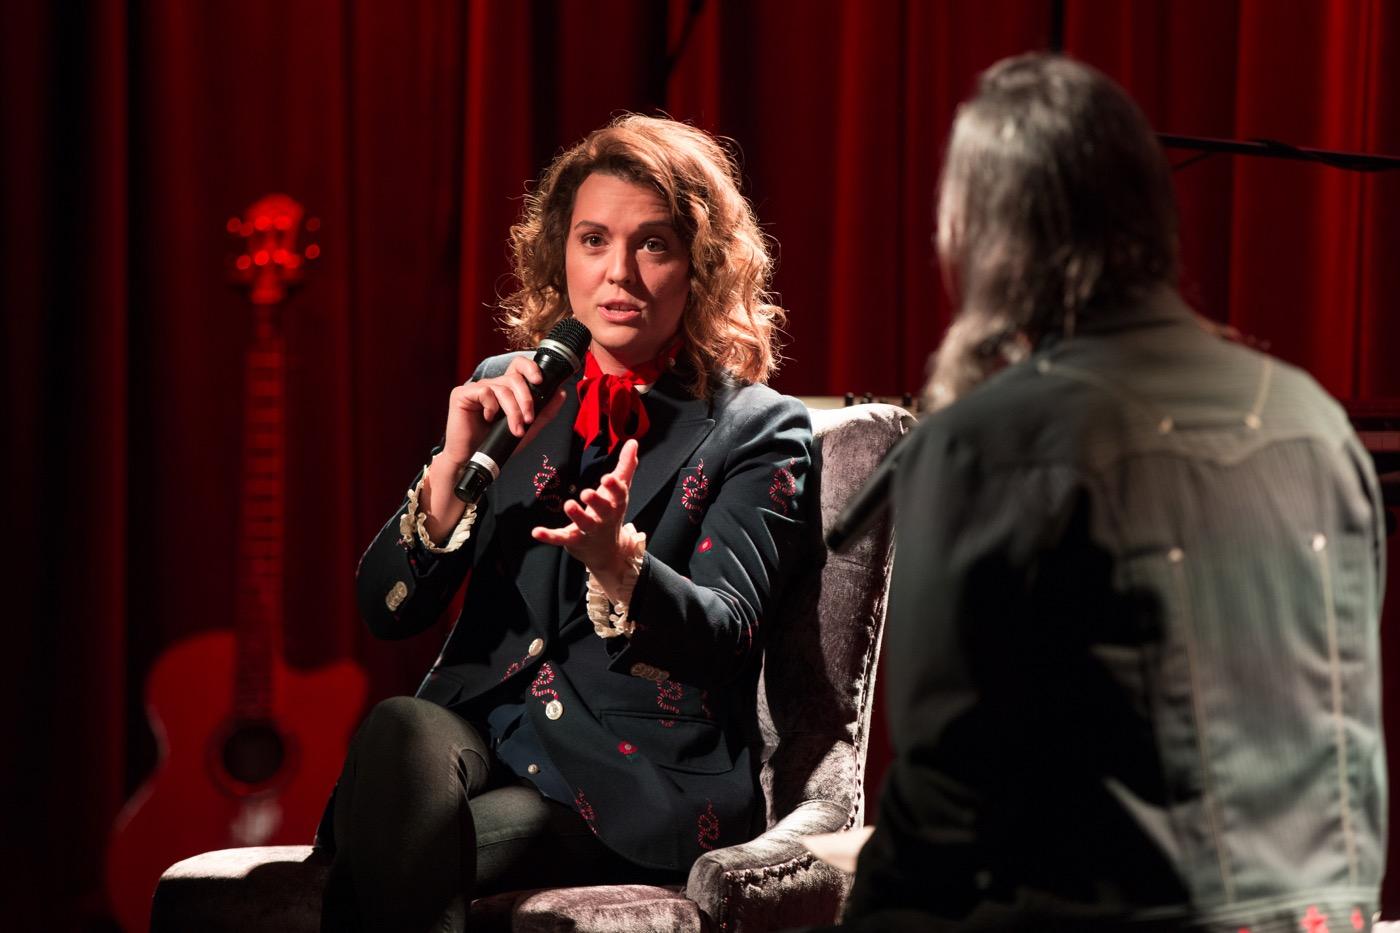 Brandi Carlile @ the Grammy Museum 7/12/18. Photo by Sonya Singh (@Sonyacansingh) for www.BlurredCulture.com.